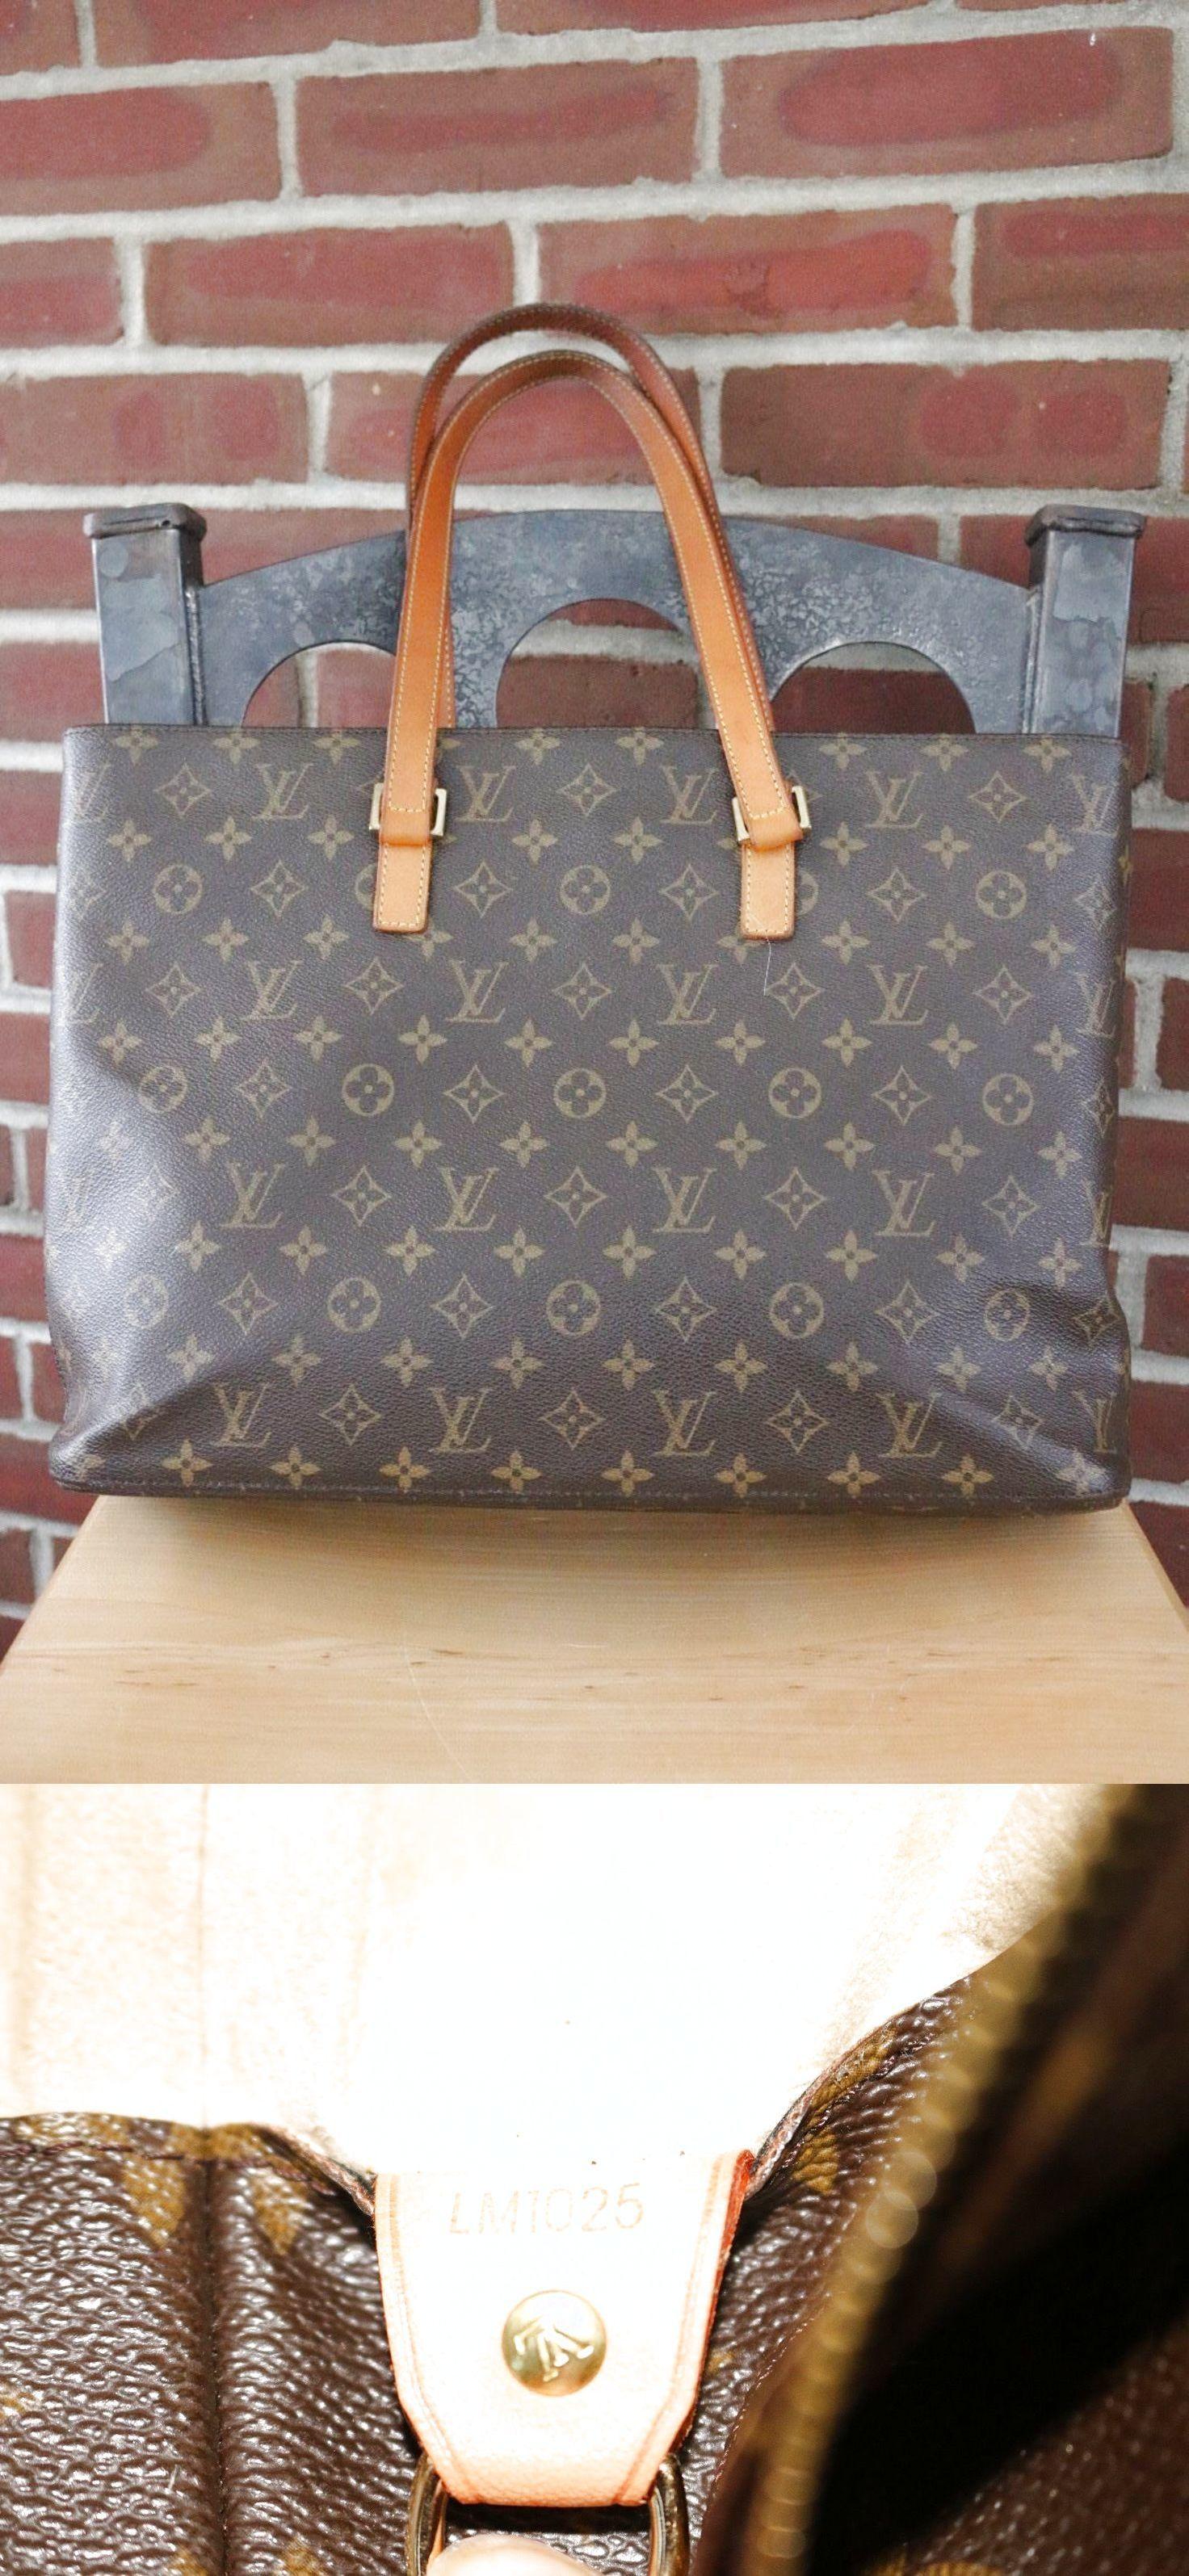 91e5ea2693b3 Authentic Louis Vuitton Monogram Luco Tote Bag  450.0